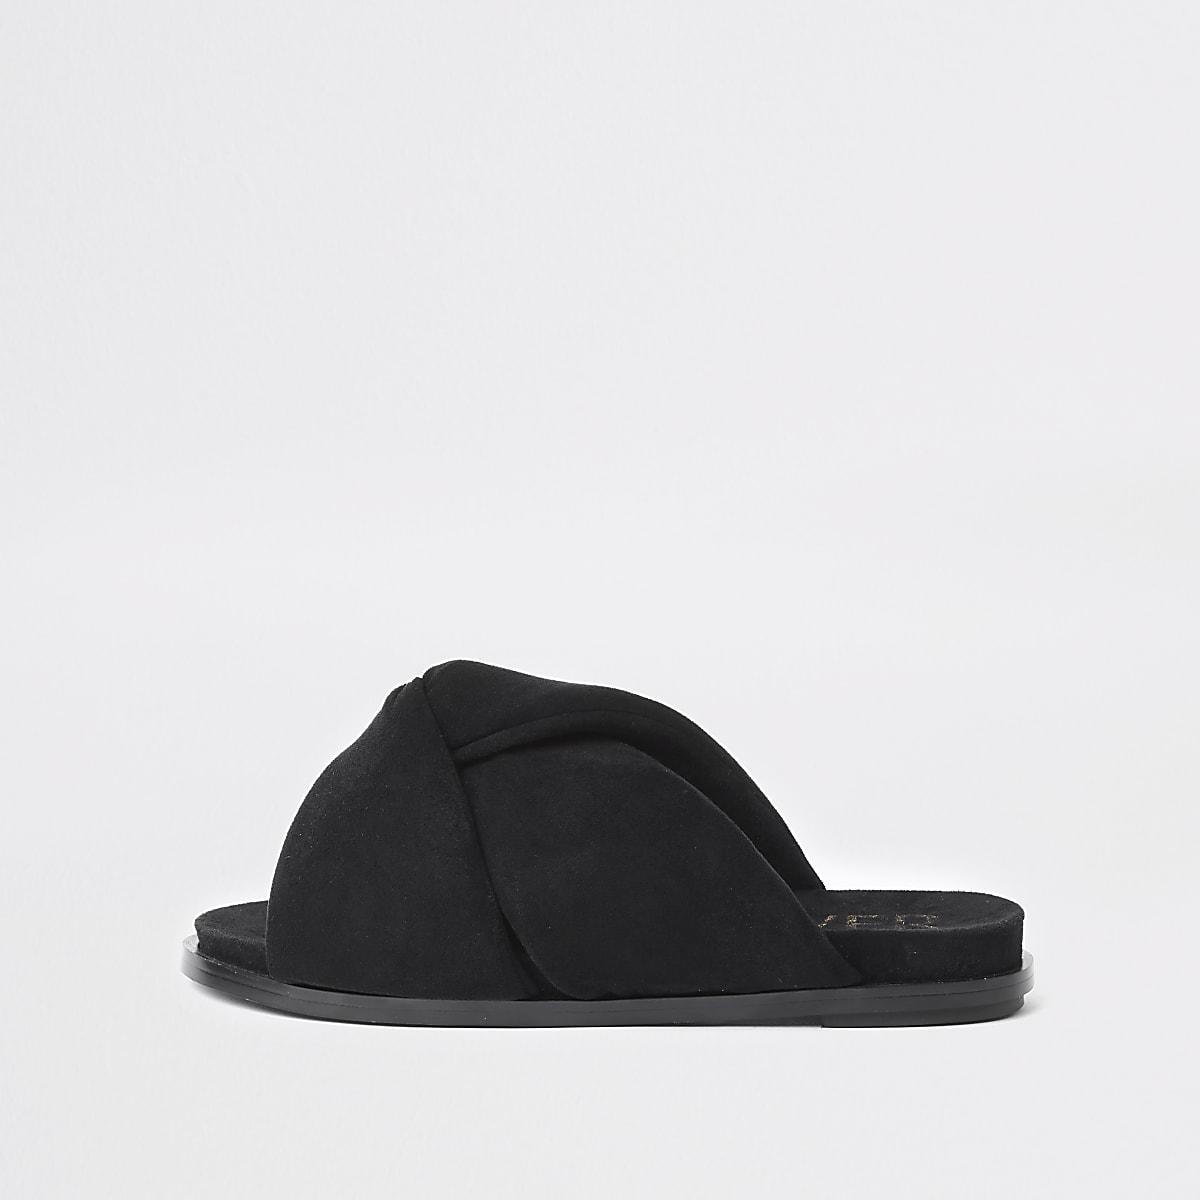 95d99175bcac Black padded knot detail sandal - Sandals - Shoes & Boots - women